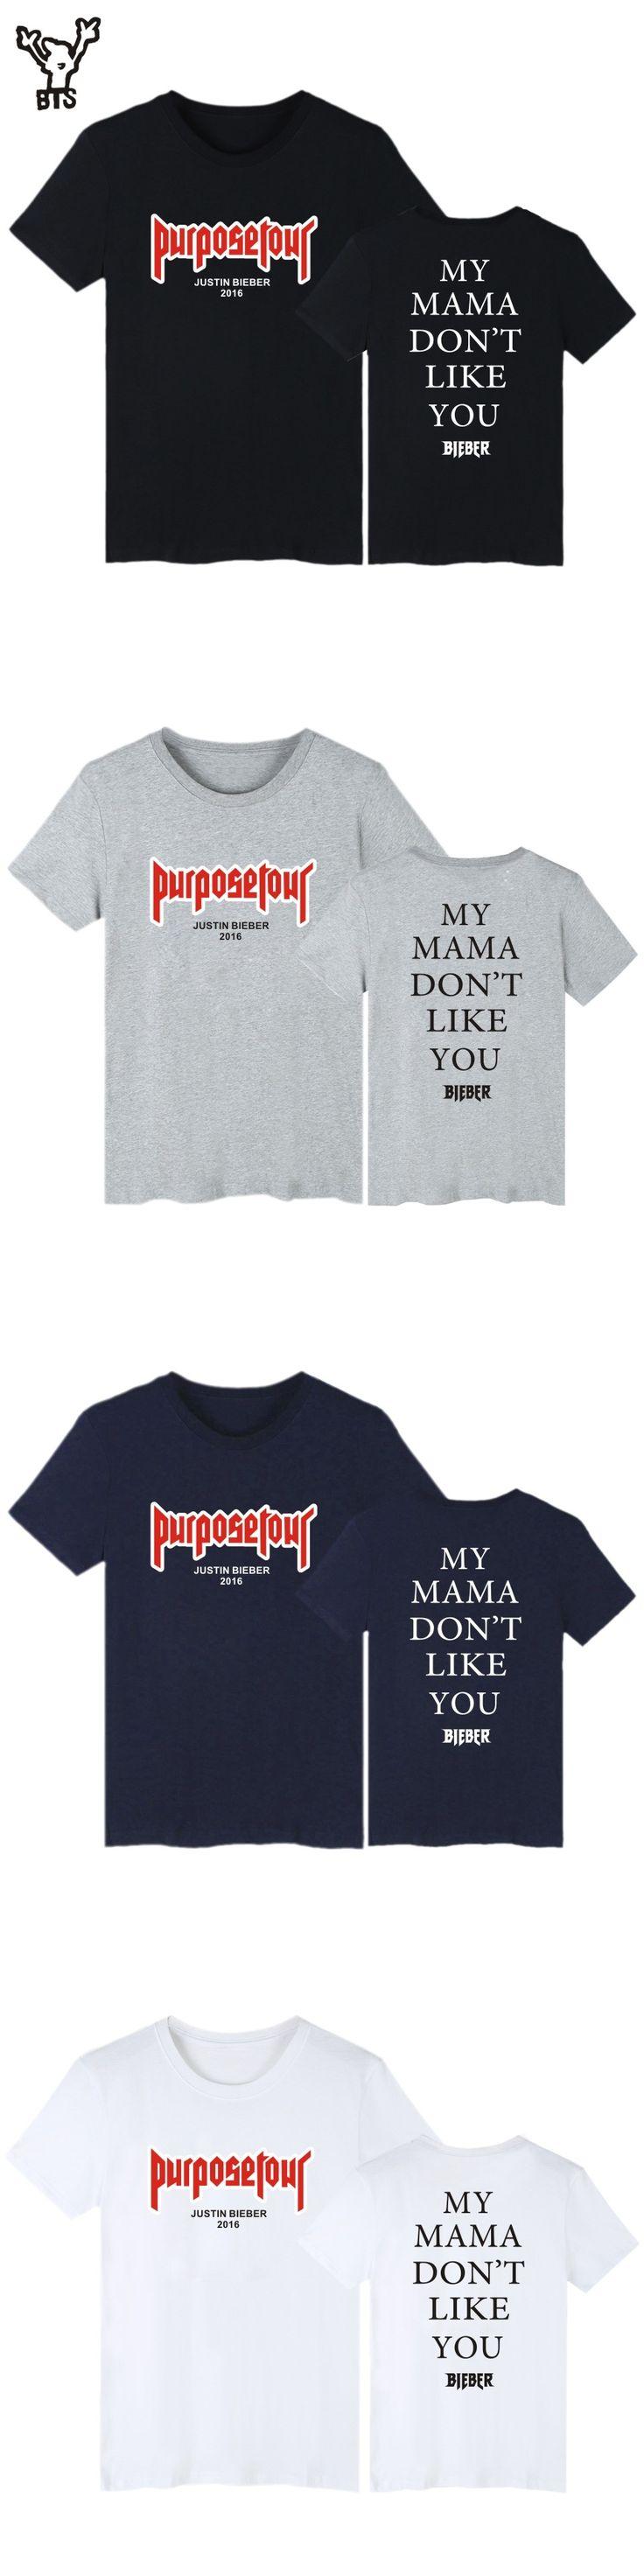 BTS Justin Bieber Purpose Tour Pop Short Sleeve Tshirts New Style Fashion Funny Casual T-Shirts  Men/Women T-shirt Plus Size 4XL